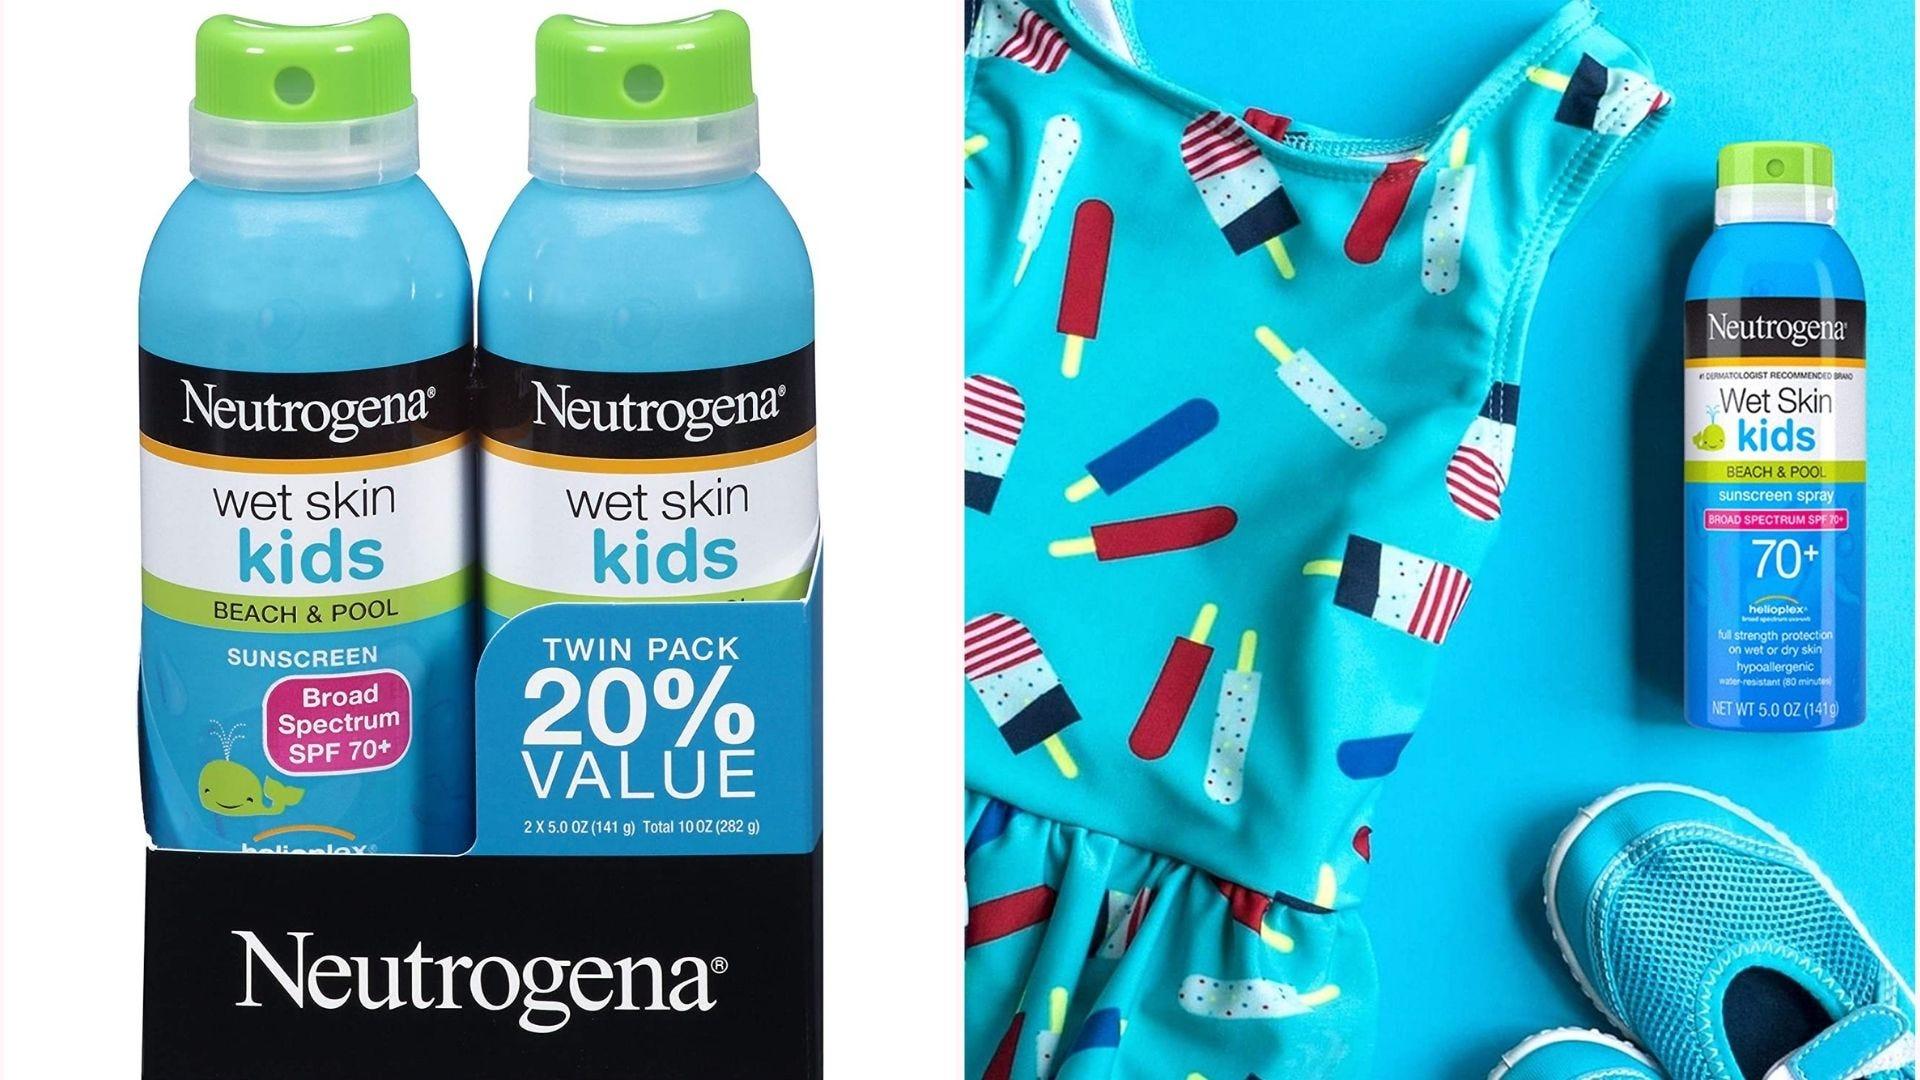 a two-pack of Neutrogena Kids Wet Skin spray sunscreen; a bottle lies next to a swimsuit